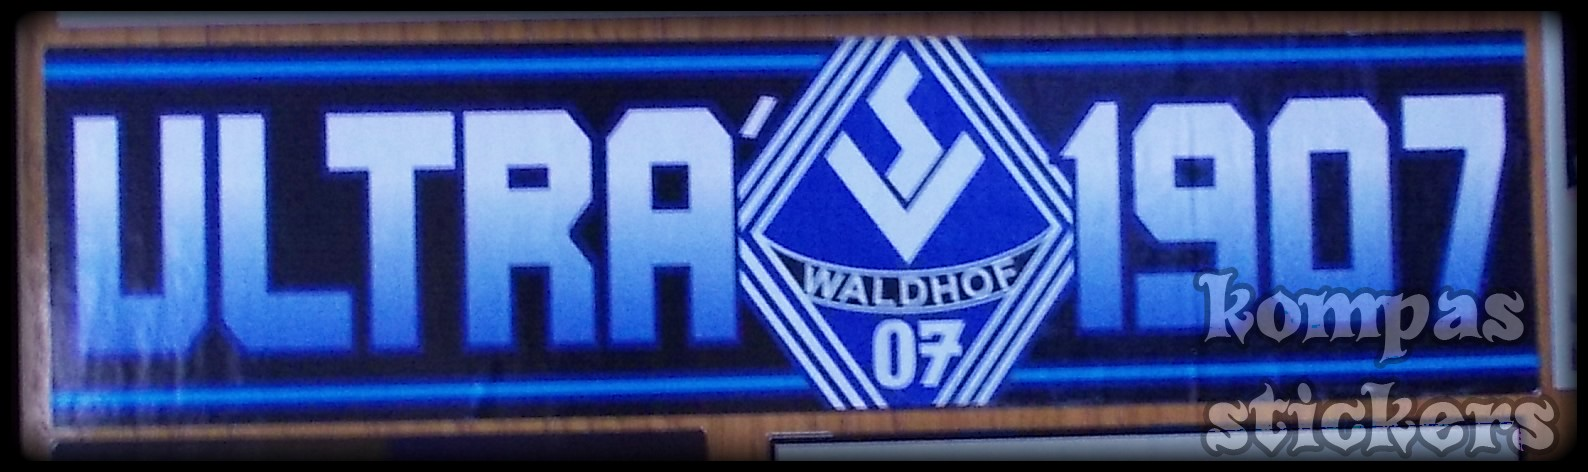 WALDHOF MANNHEIM Valdho12